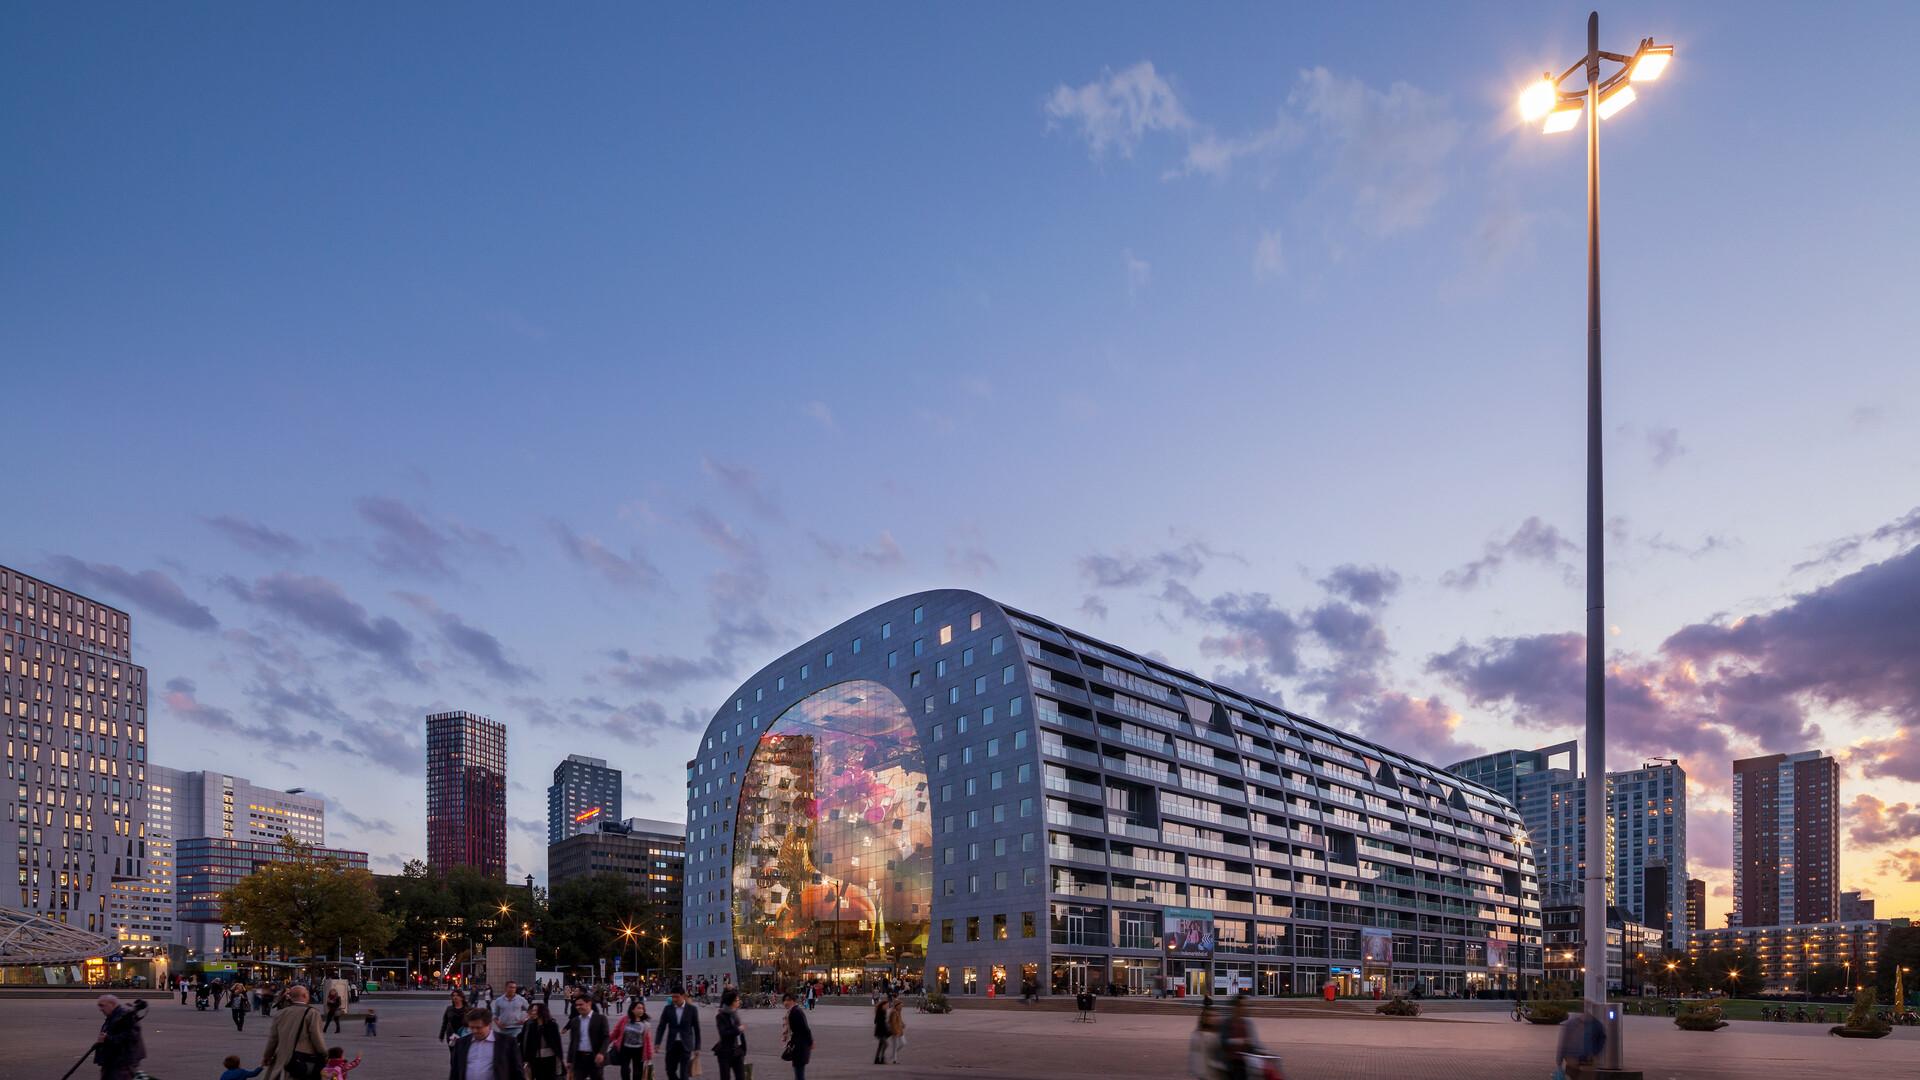 Markthal, Rotterdam, the Netherlands, MVRDV, Pennings Akoestiek, Daria Scagliola, Stijn Brakkee, ROCKFON Mono Acoustic, Dark grey